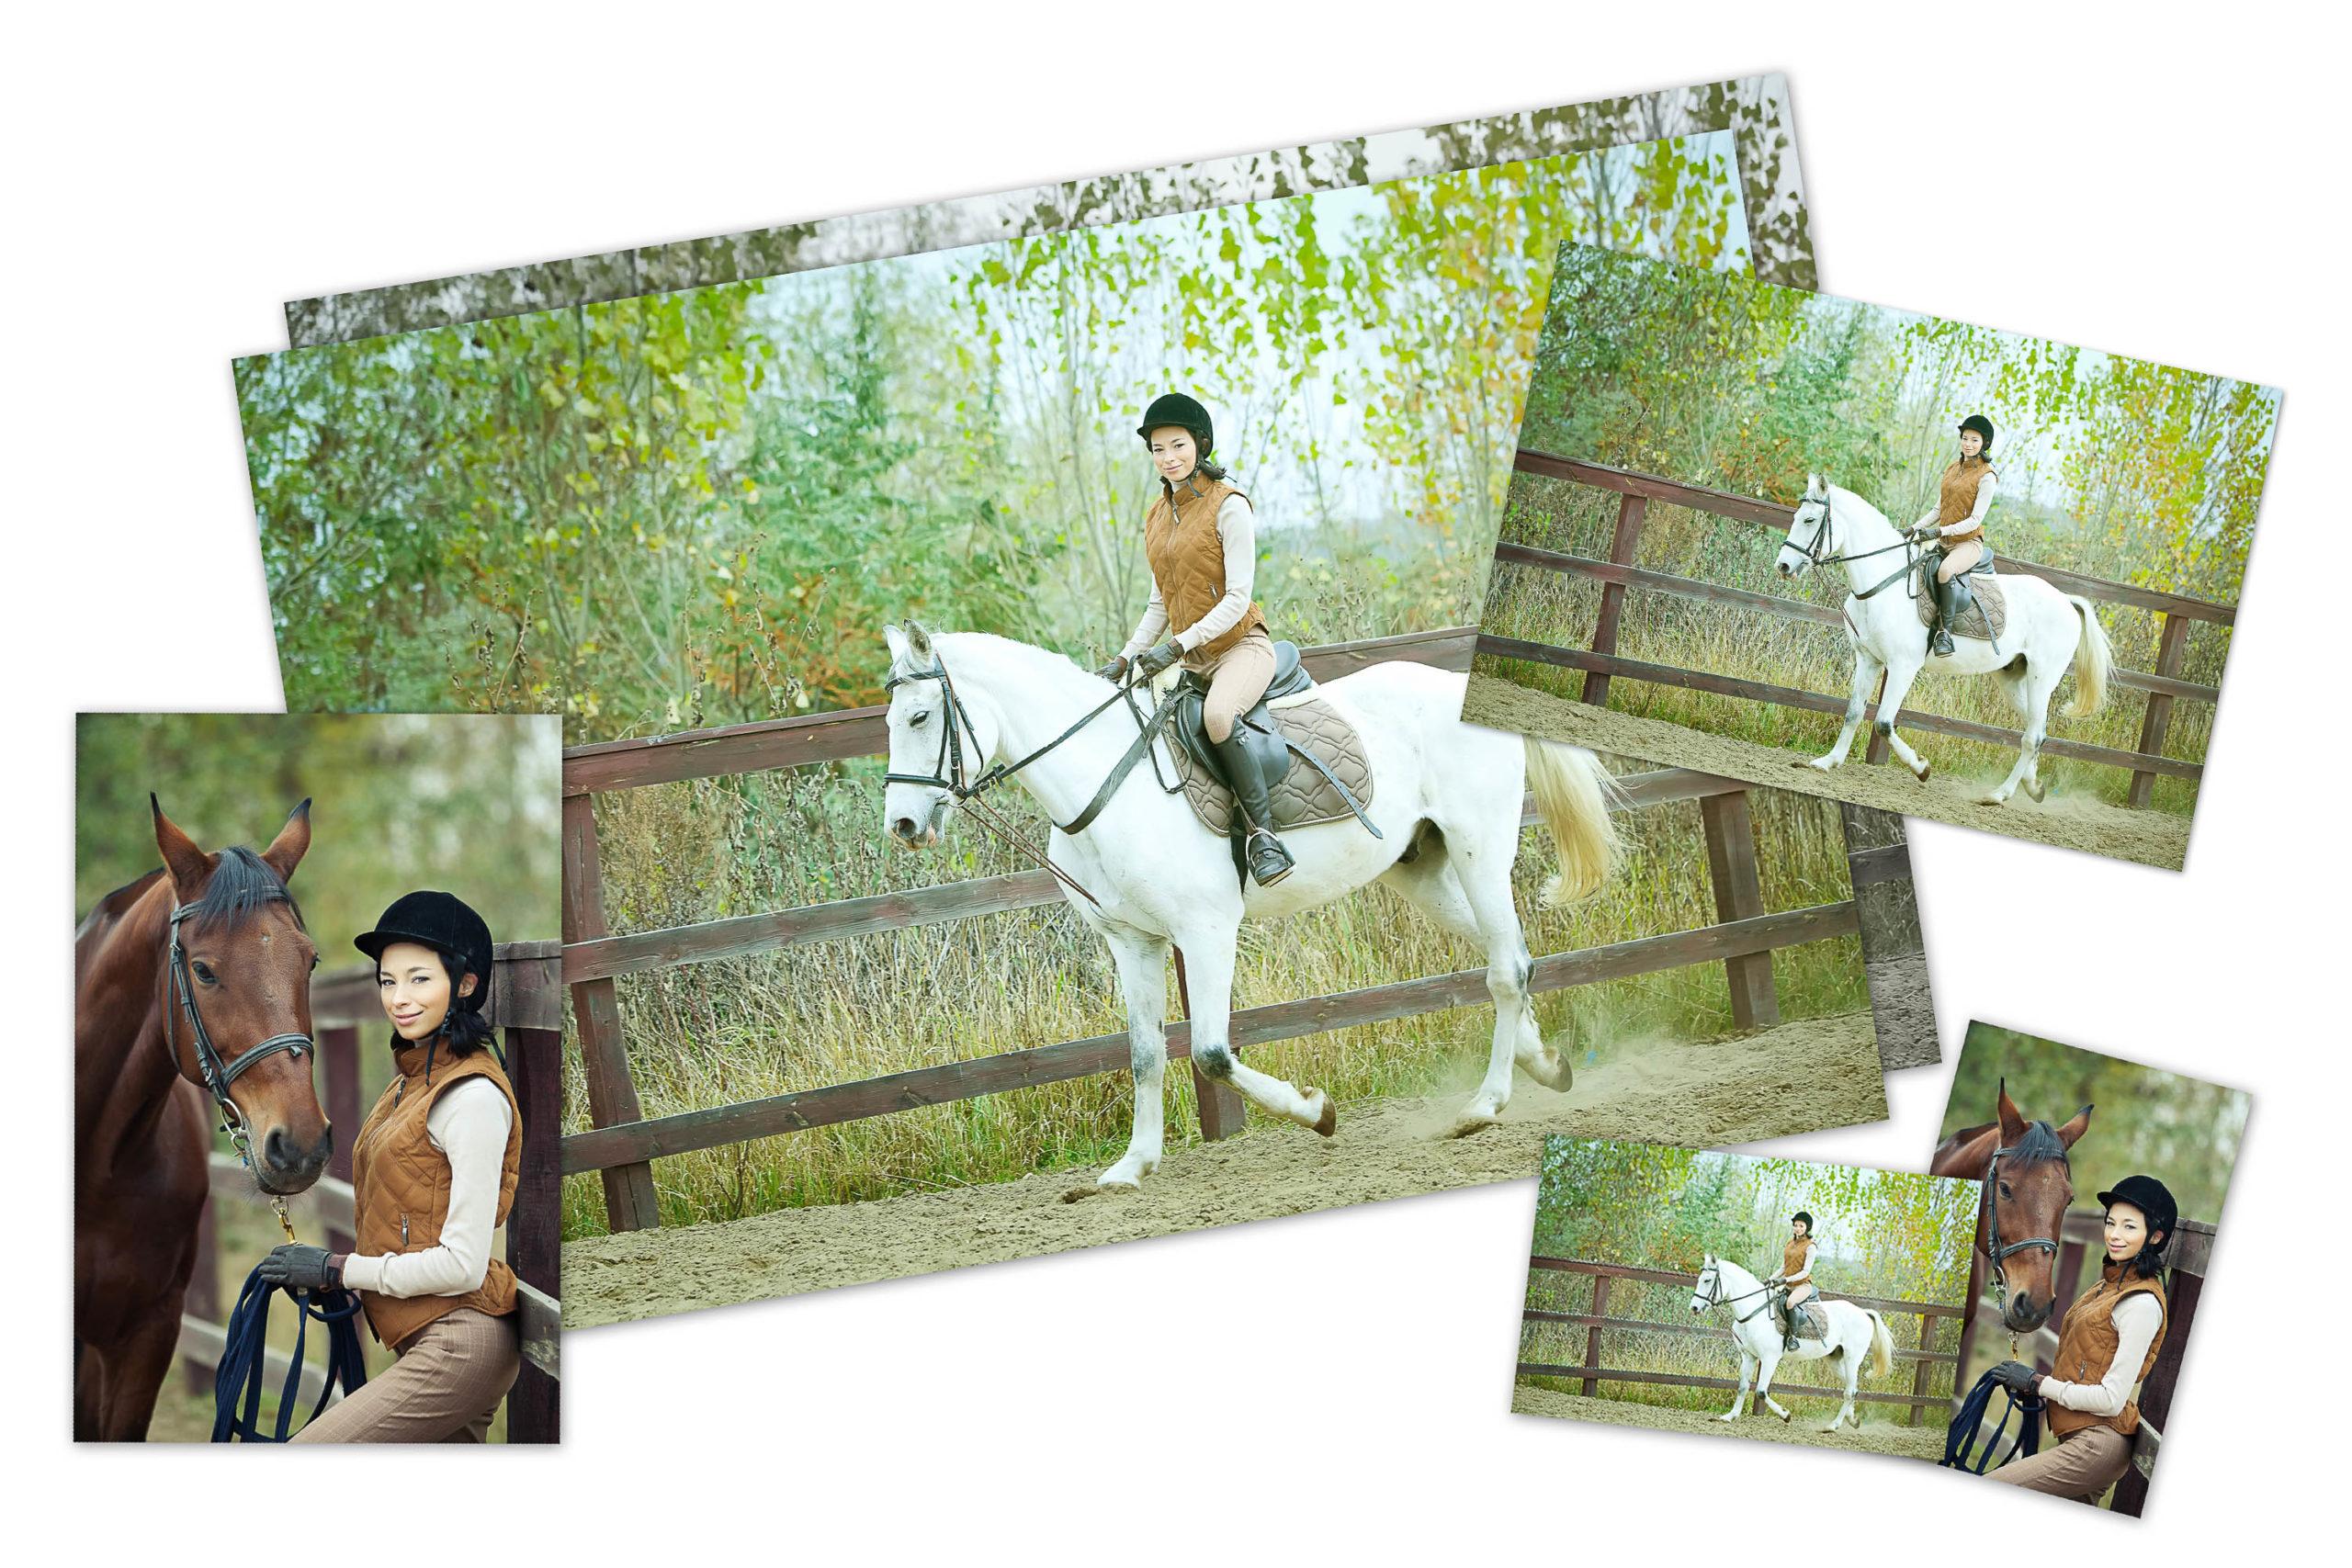 Fotografien auf Fotopapier